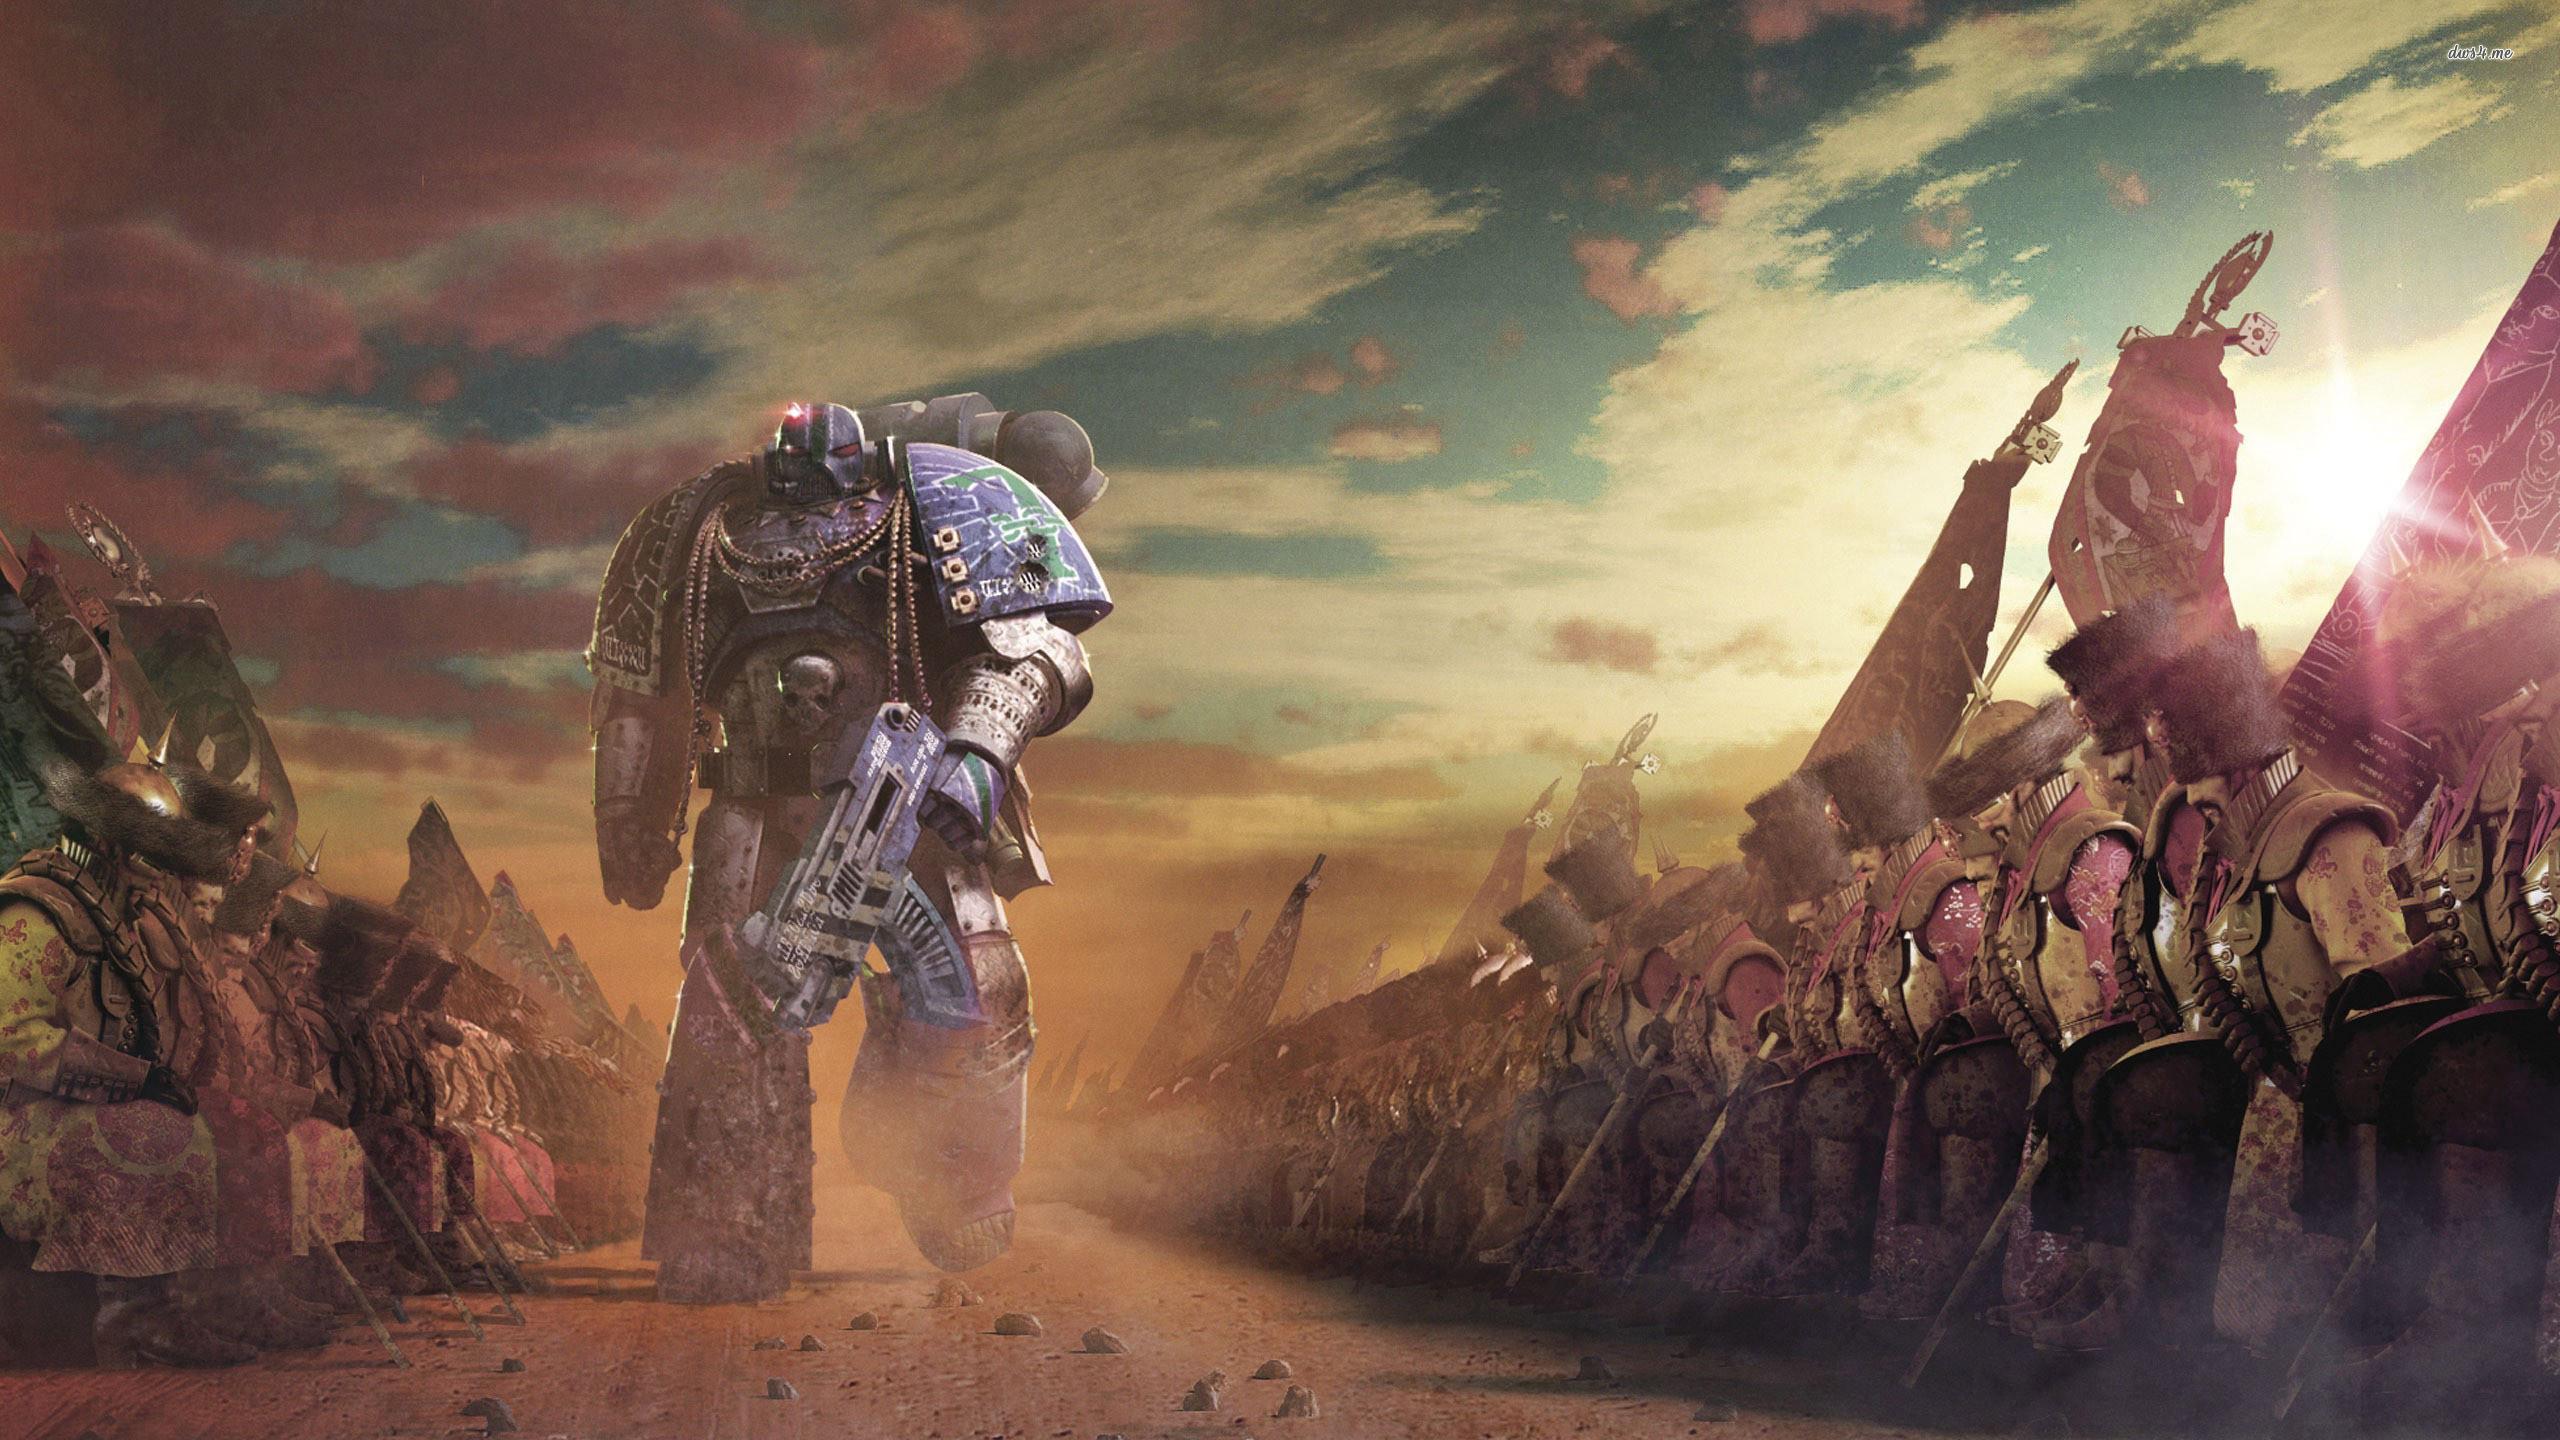 Warhammer 40k Desktop Backgrounds Gallery (85 Plus) – juegosrev.com –  juegosrev.com